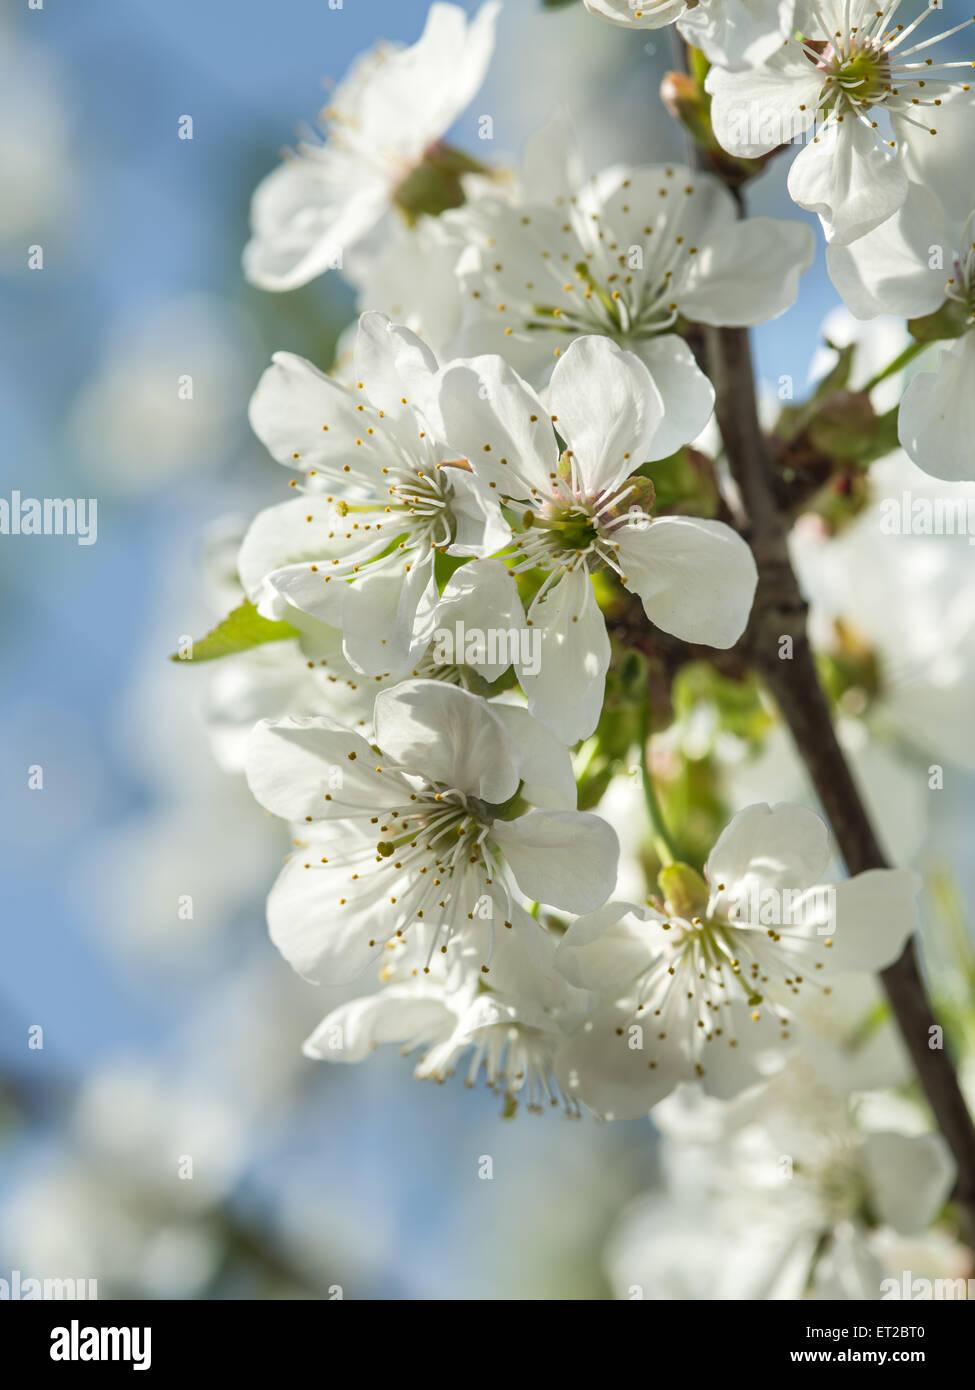 Blooming apple tree twig. Closeup shot. - Stock Image